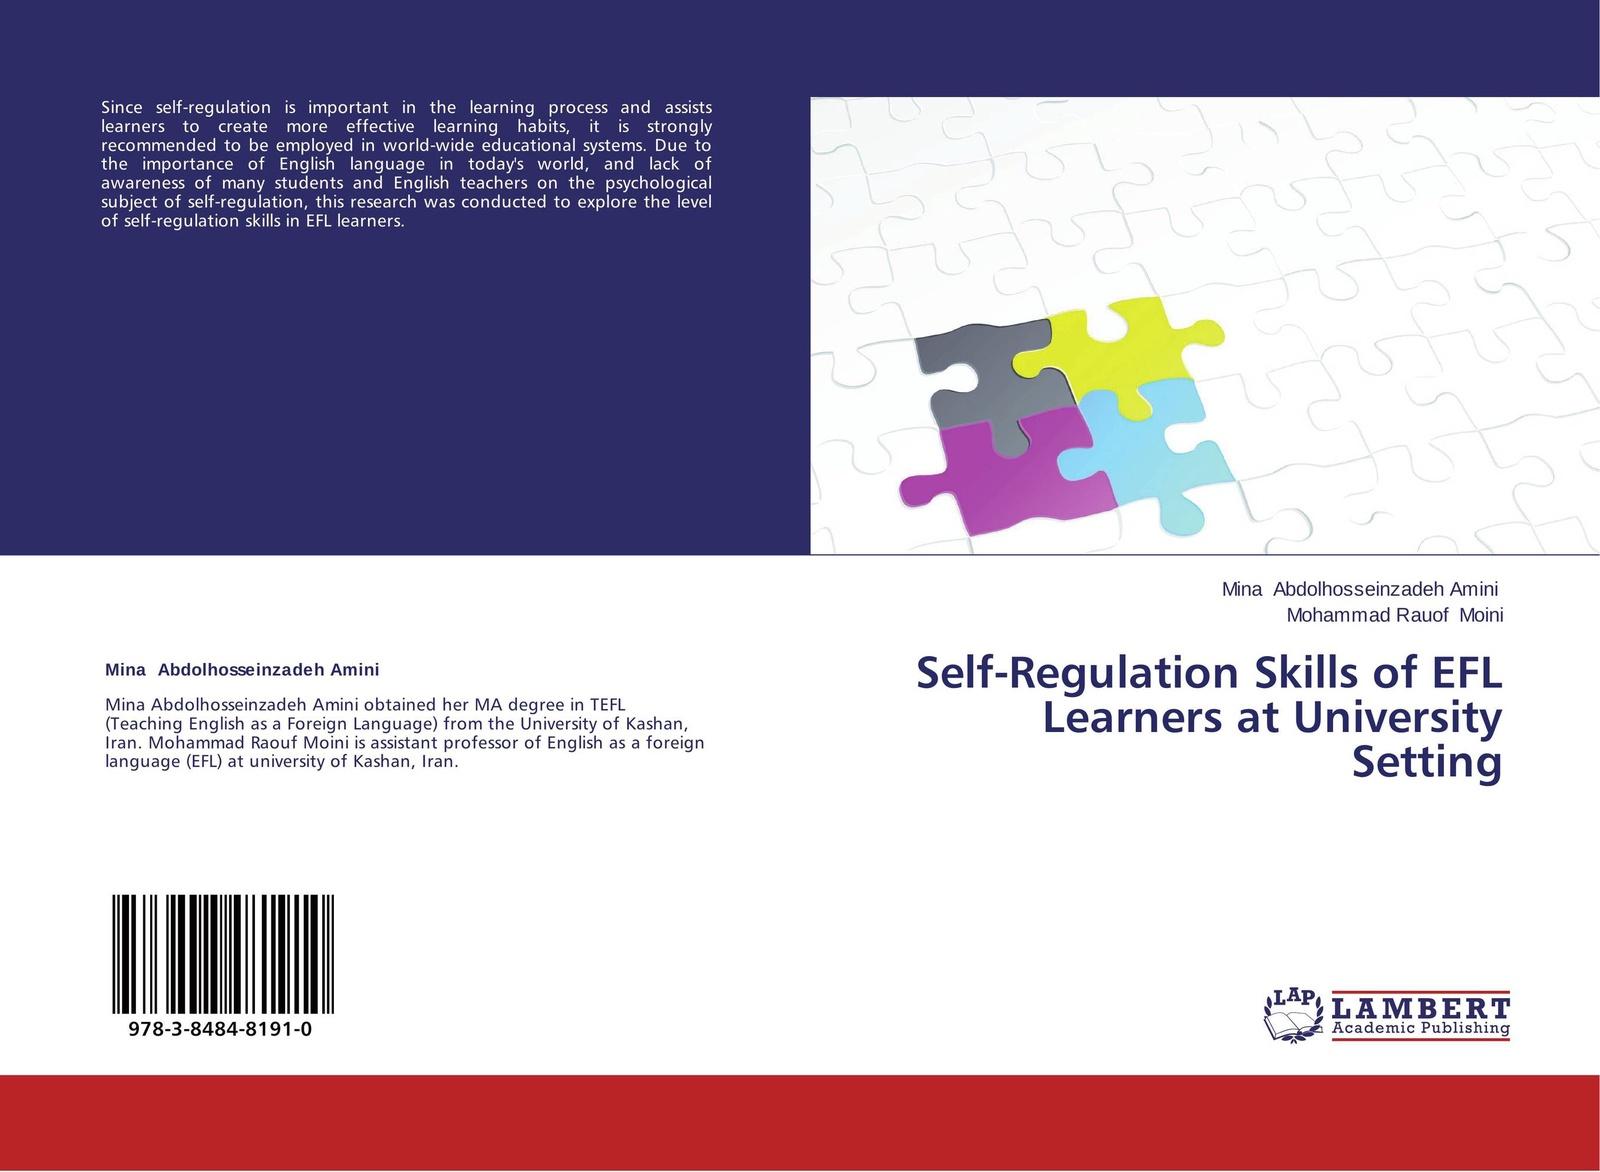 Mina Abdolhosseinzadeh Amini and Mohammad Rauof Moini Self-Regulation Skills of EFL Learners at University Setting цена